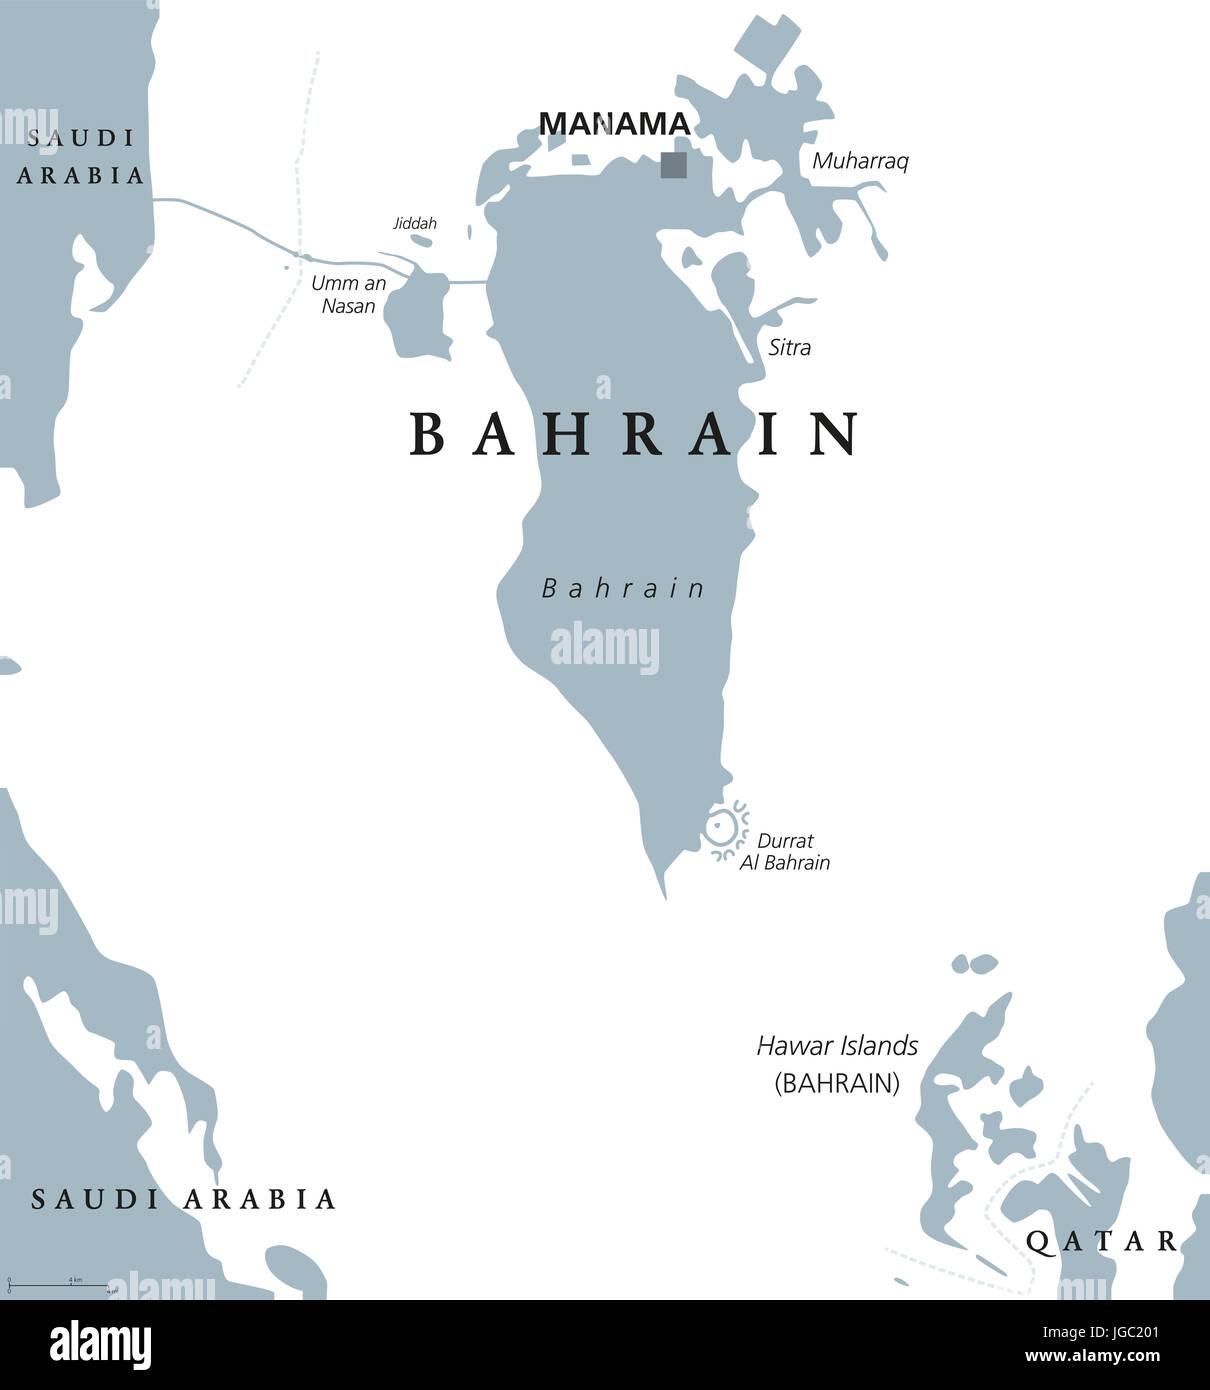 Persian Gulf Map Stock Photos & Persian Gulf Map Stock Images - Alamy